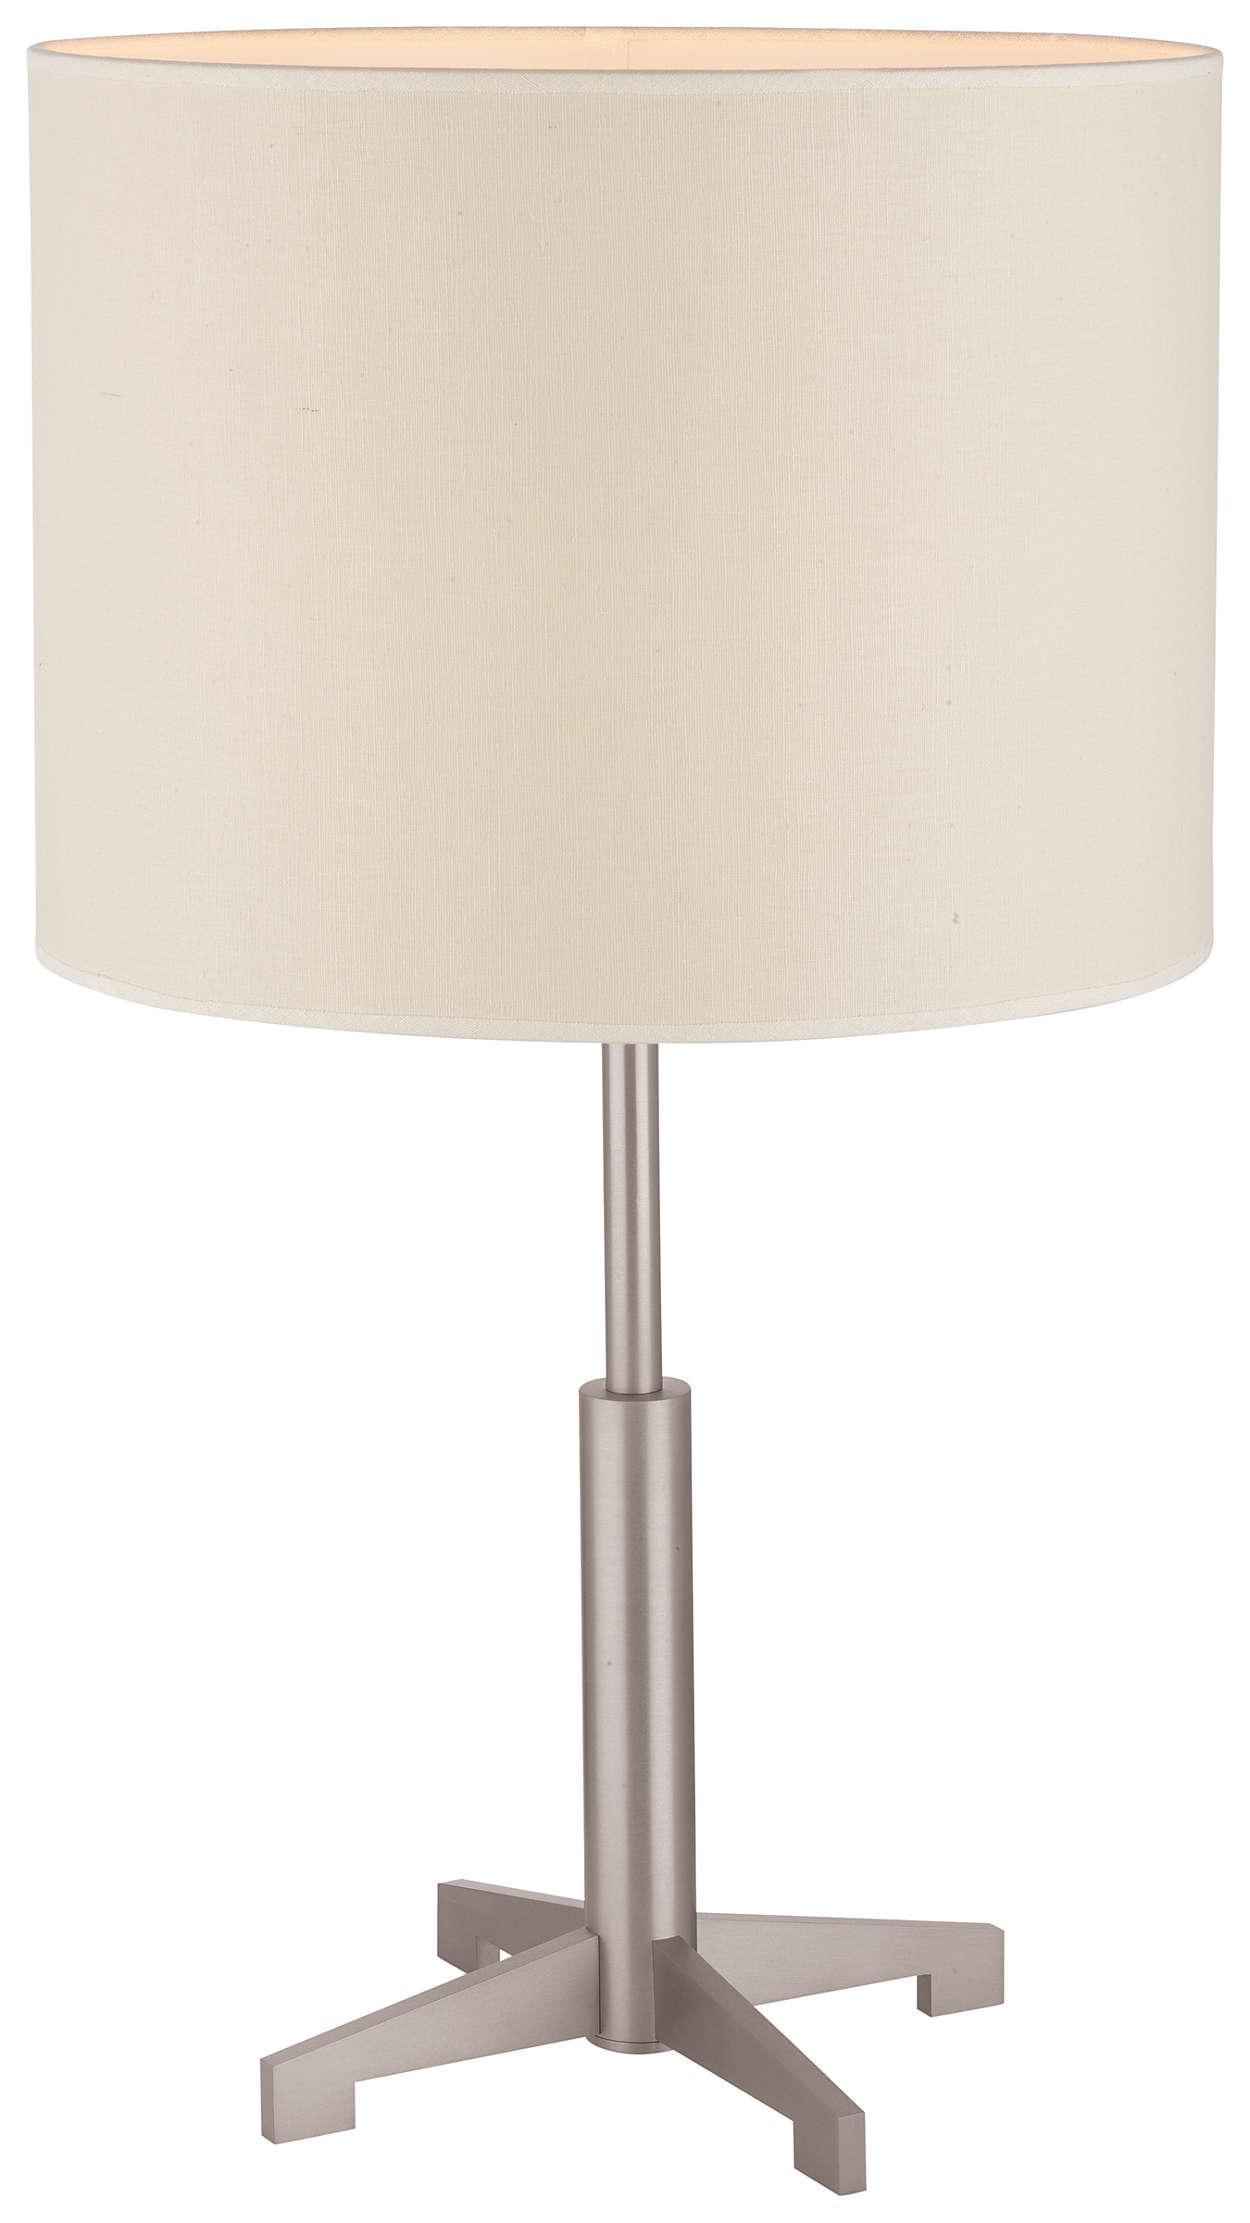 Fisher Island 1-light Table Lamp, Satin Nickel